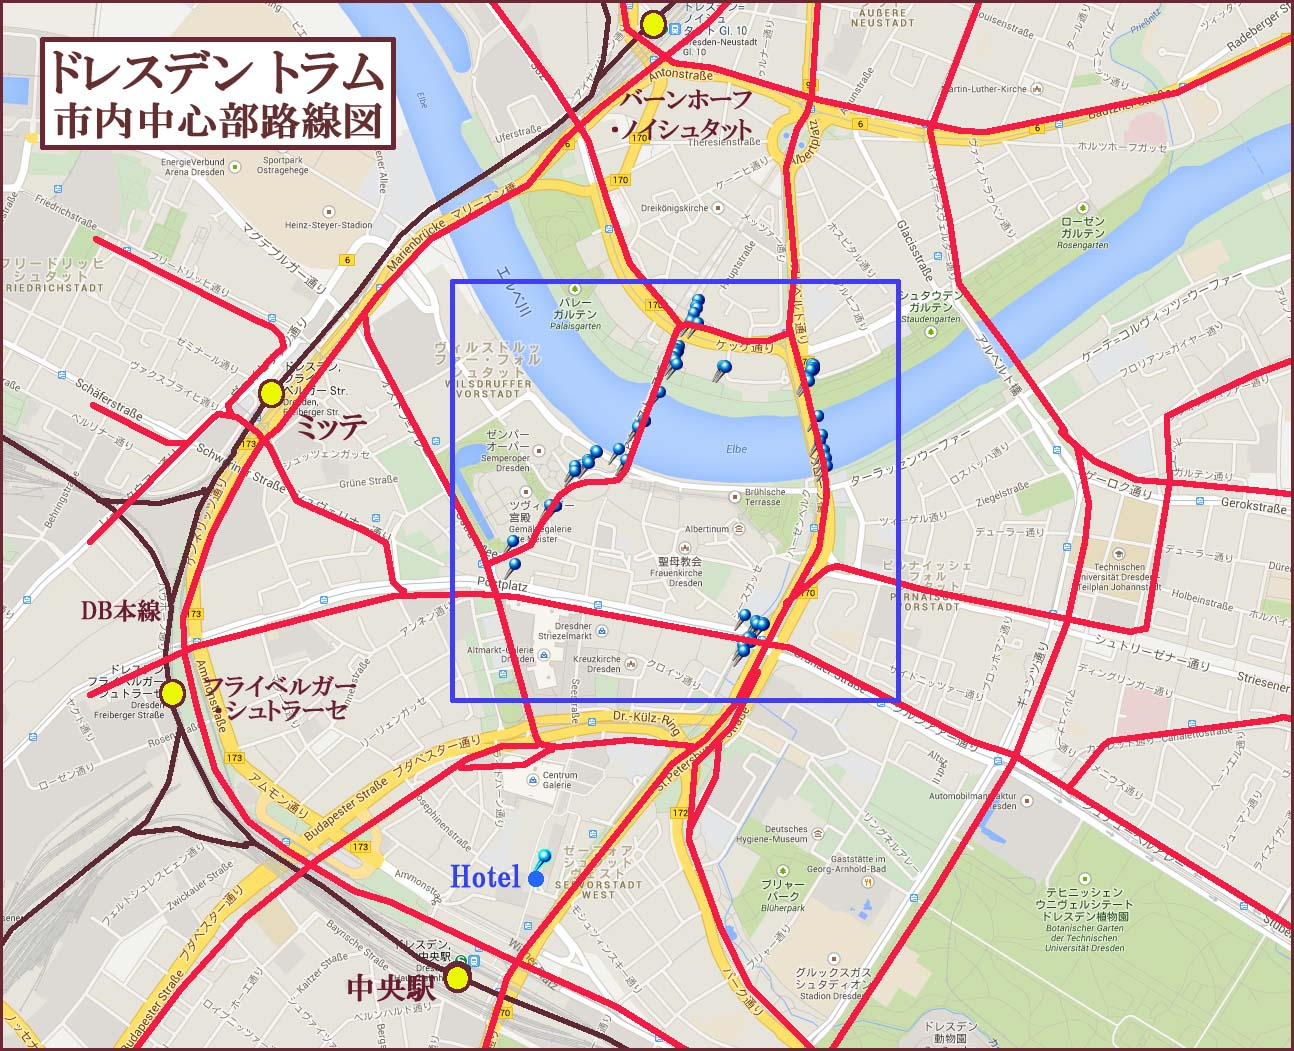 01_市内中心部トラム路線図_05